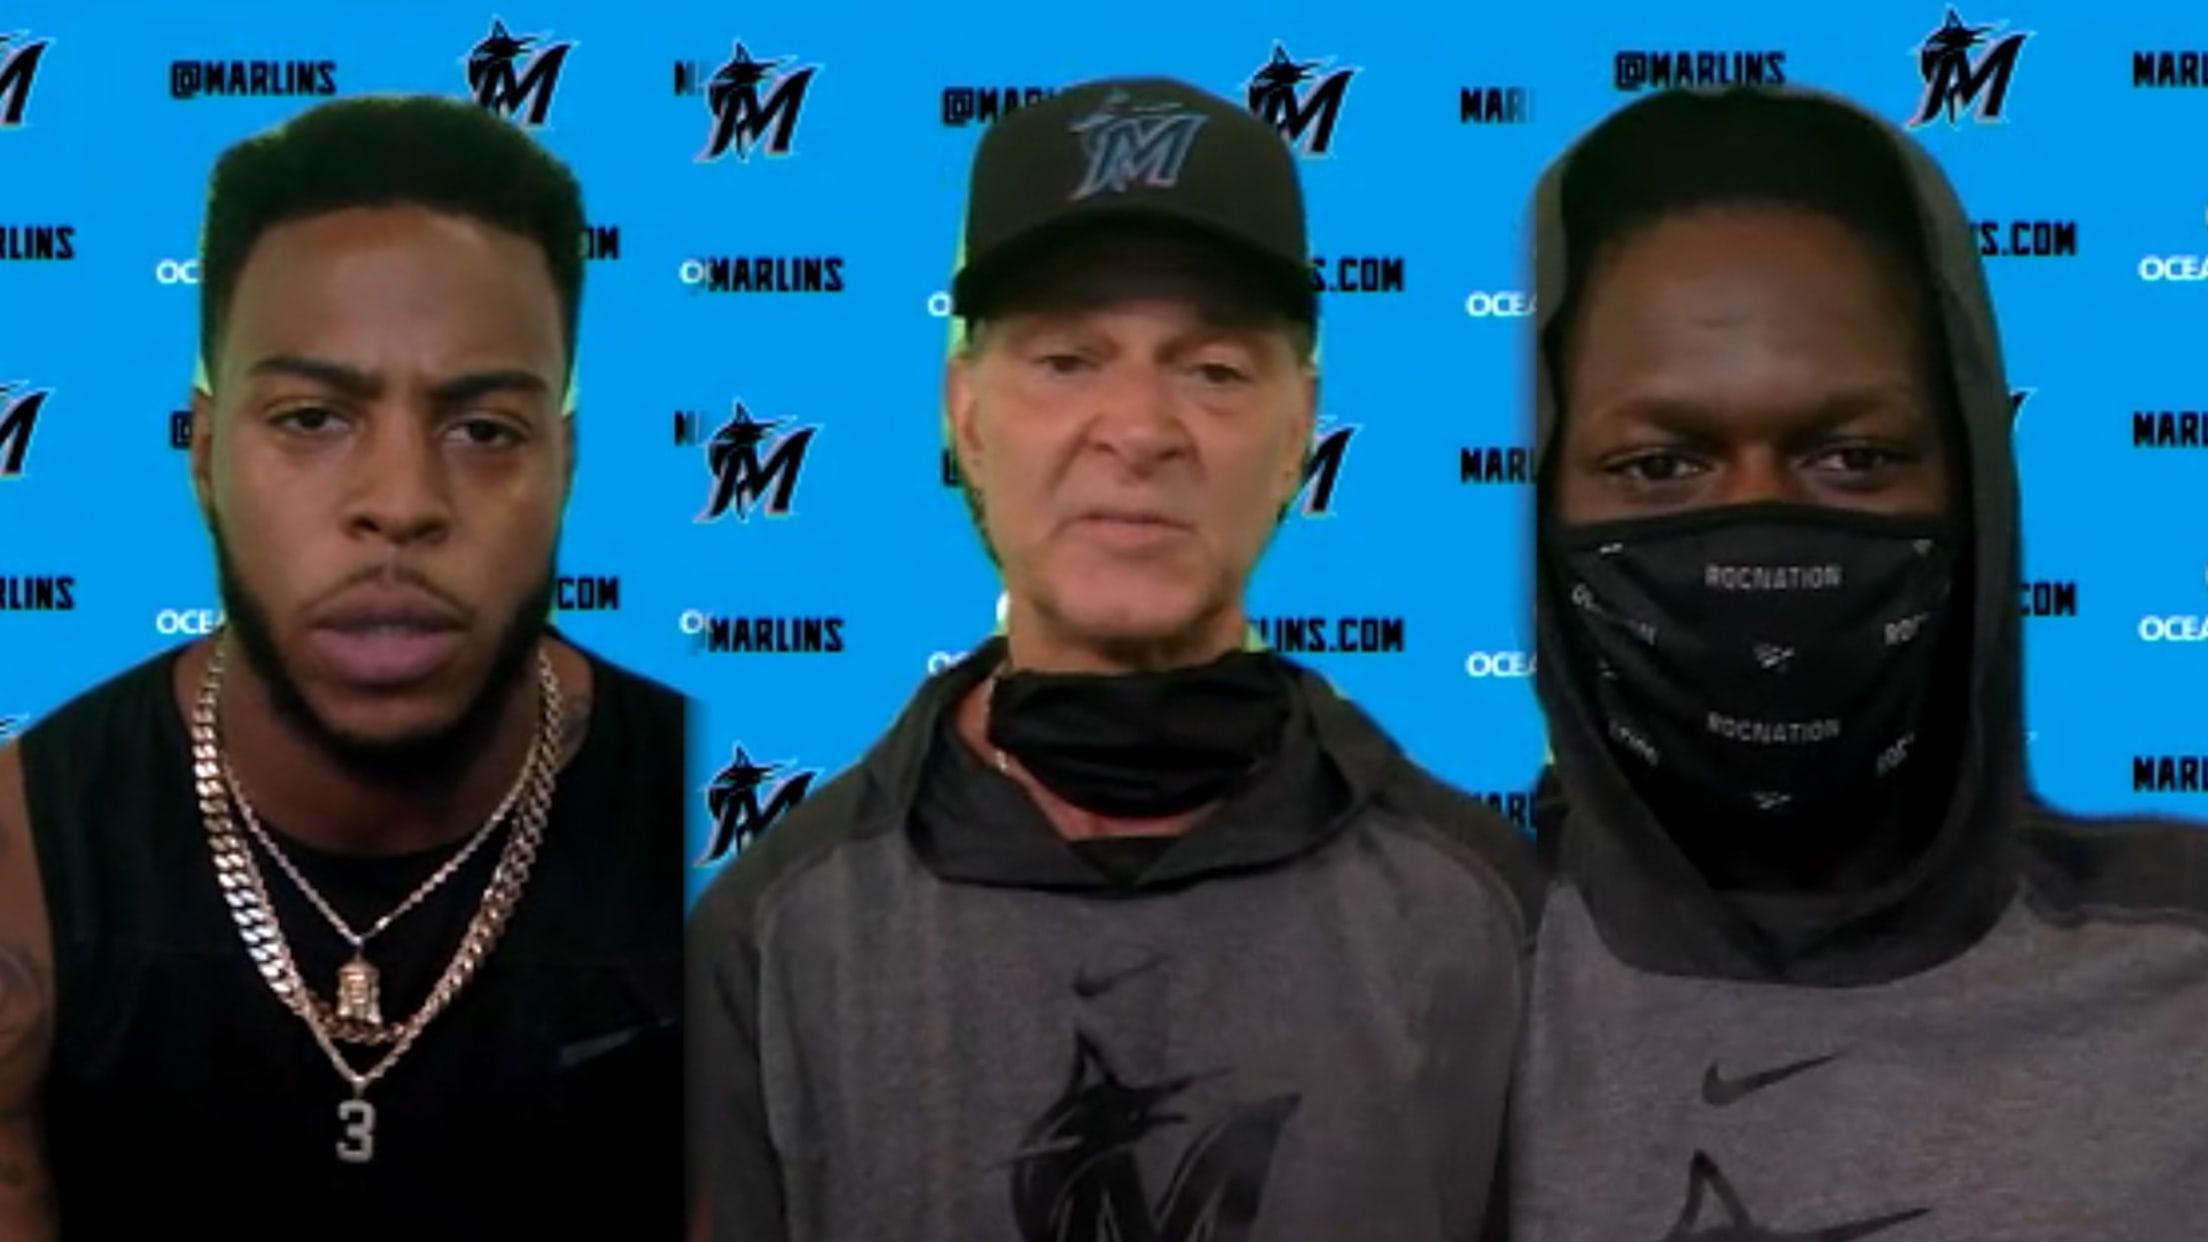 Marlins prepared for 2020 season